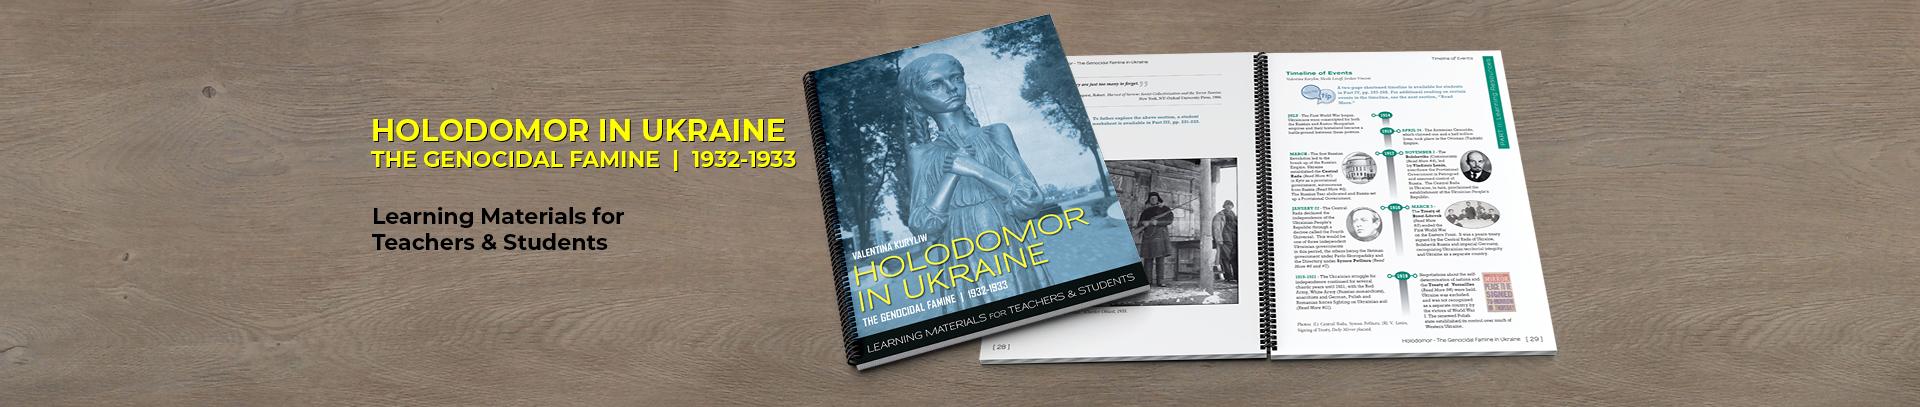 Holodomor-in-Ukraine book